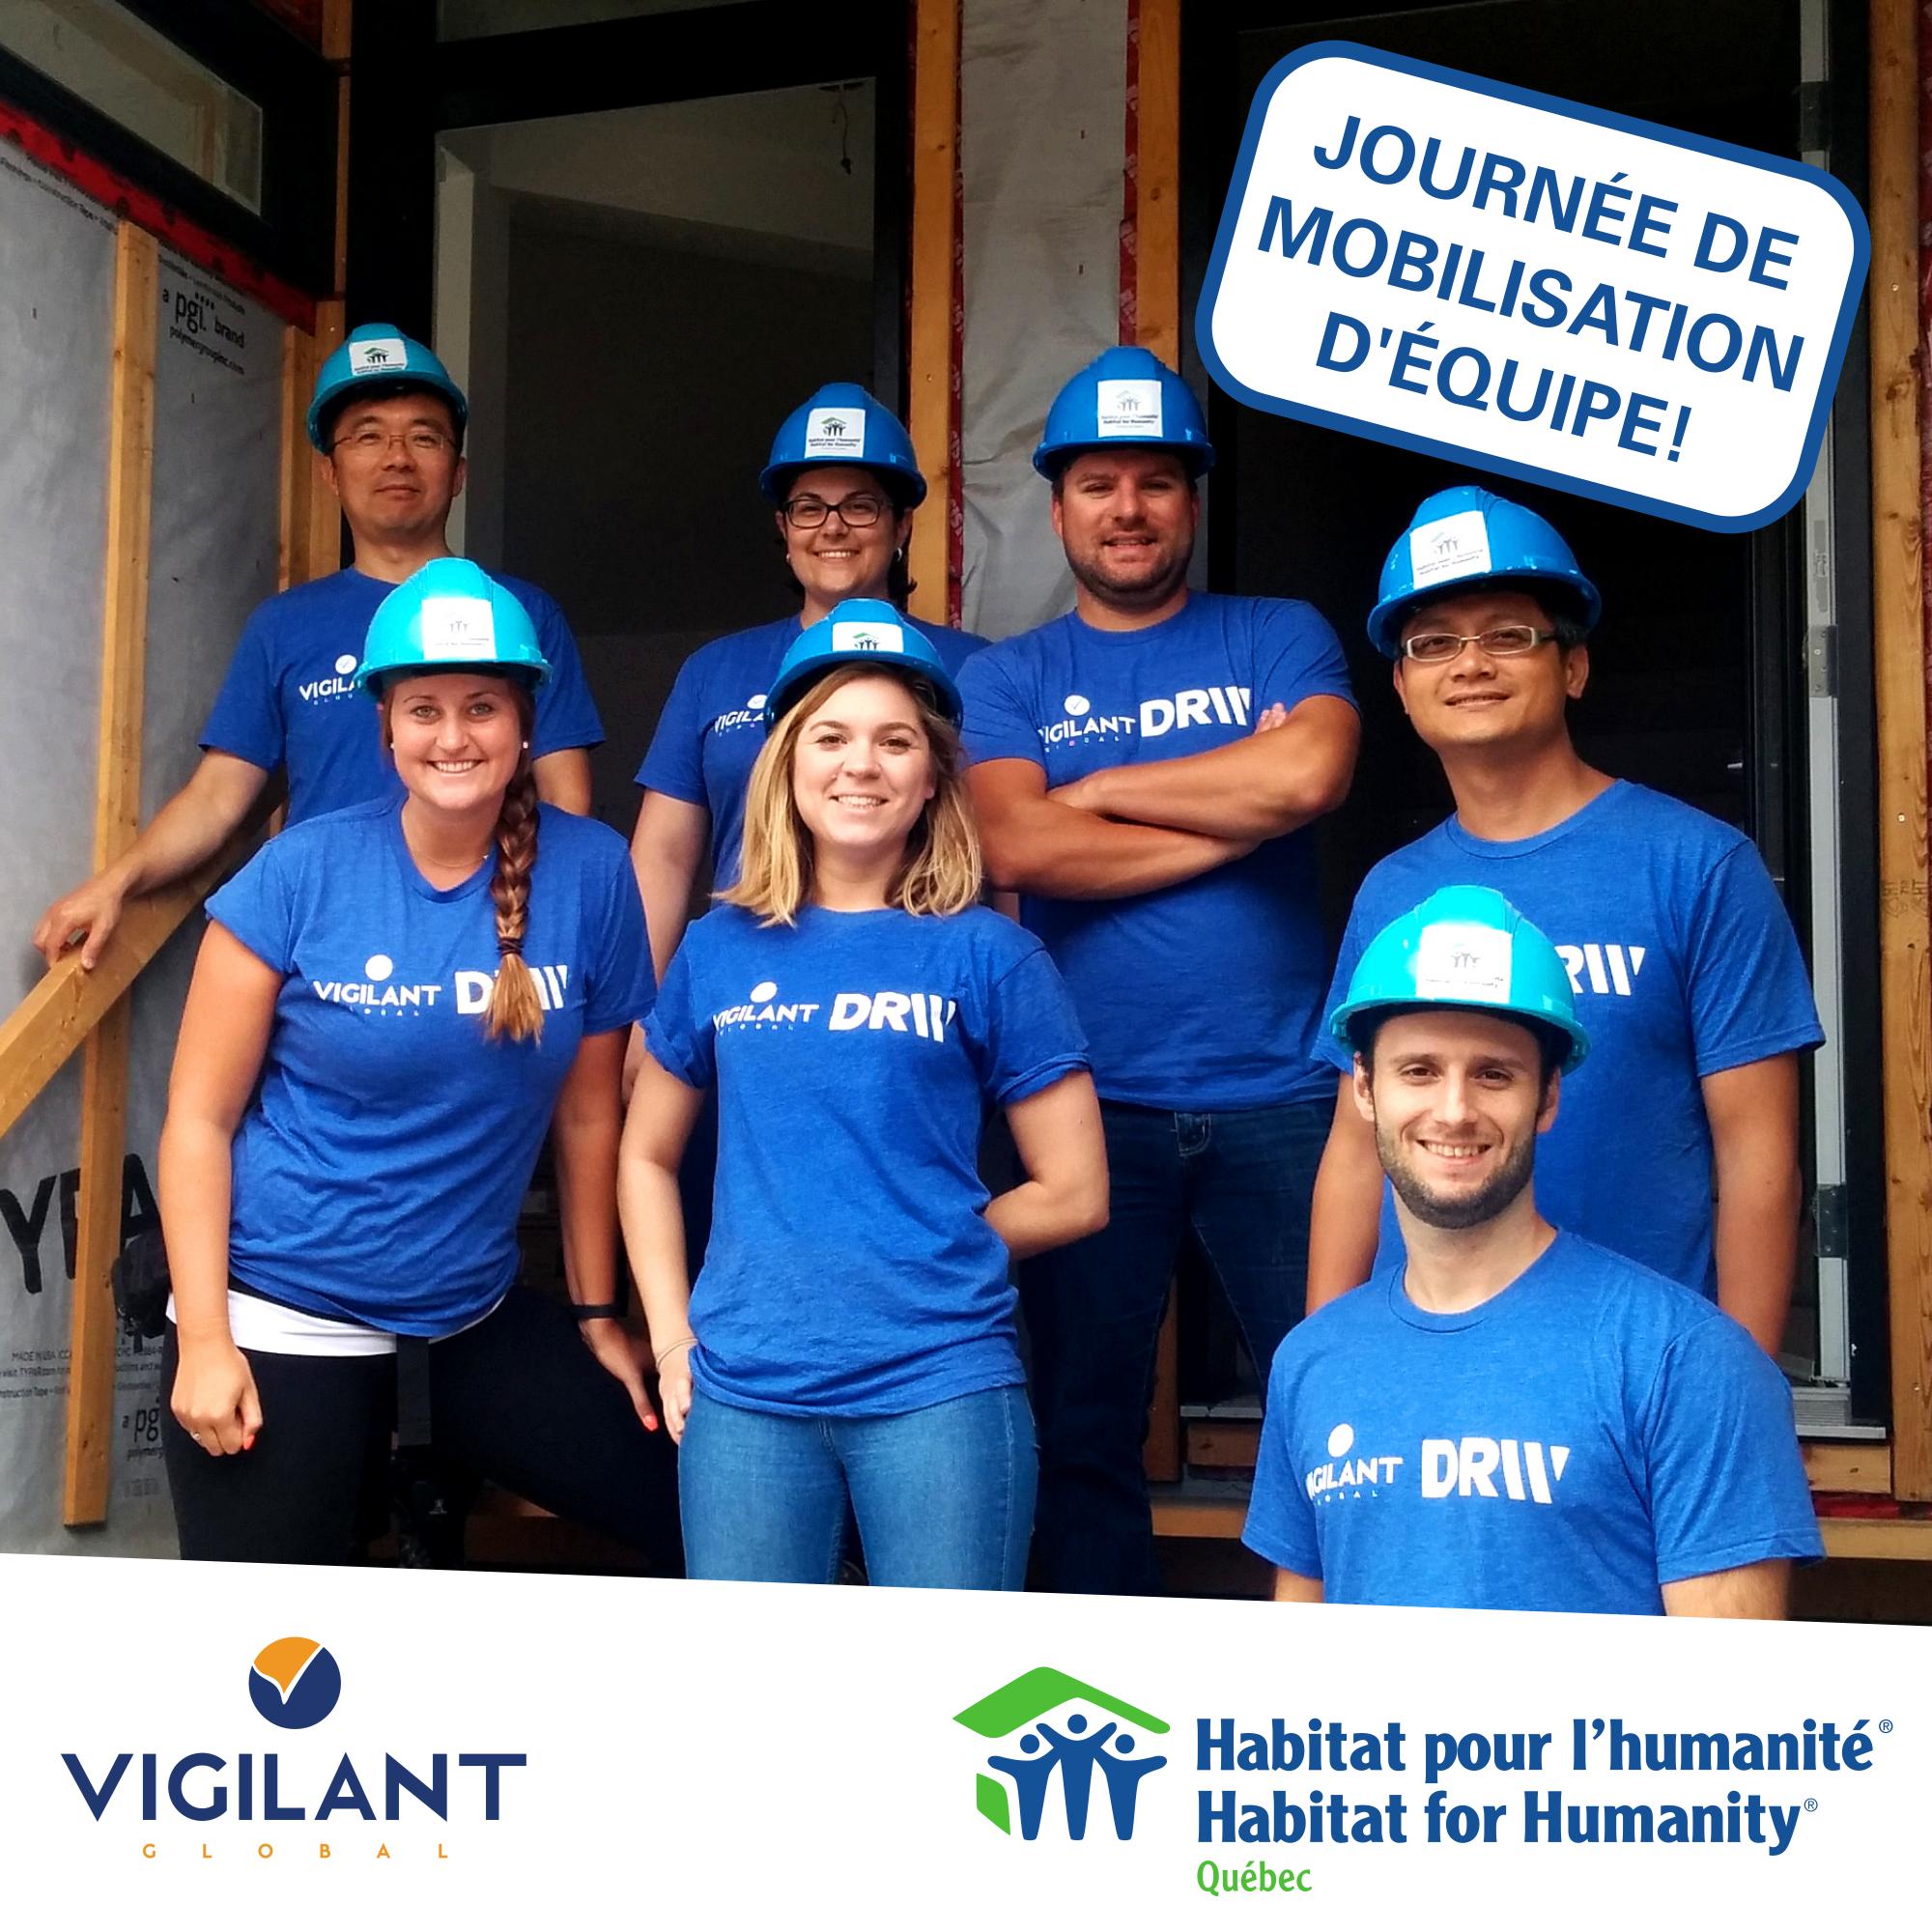 2016 - FB Vigilant Global - Mobilisation equipe